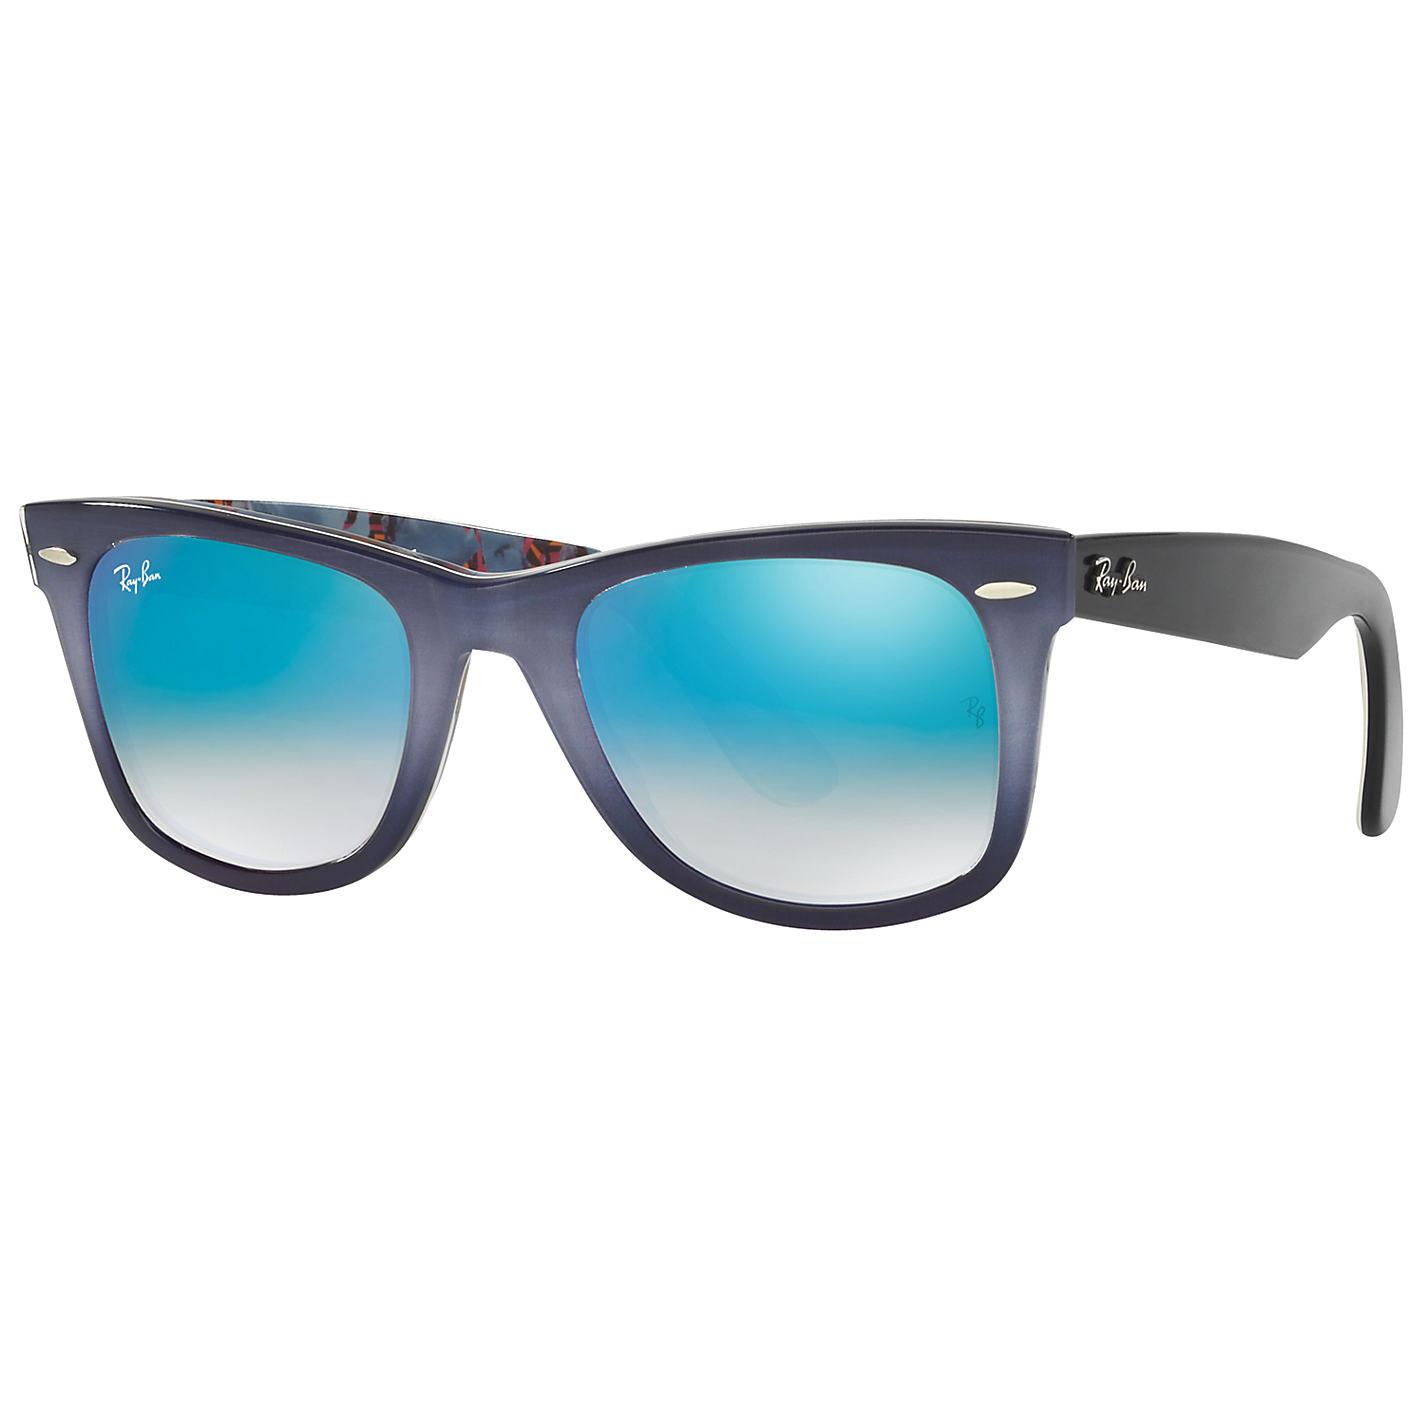 Buy Ray-Ban RB2140 Original Wayfarer Sunglasses Online at johnlewis.com ...